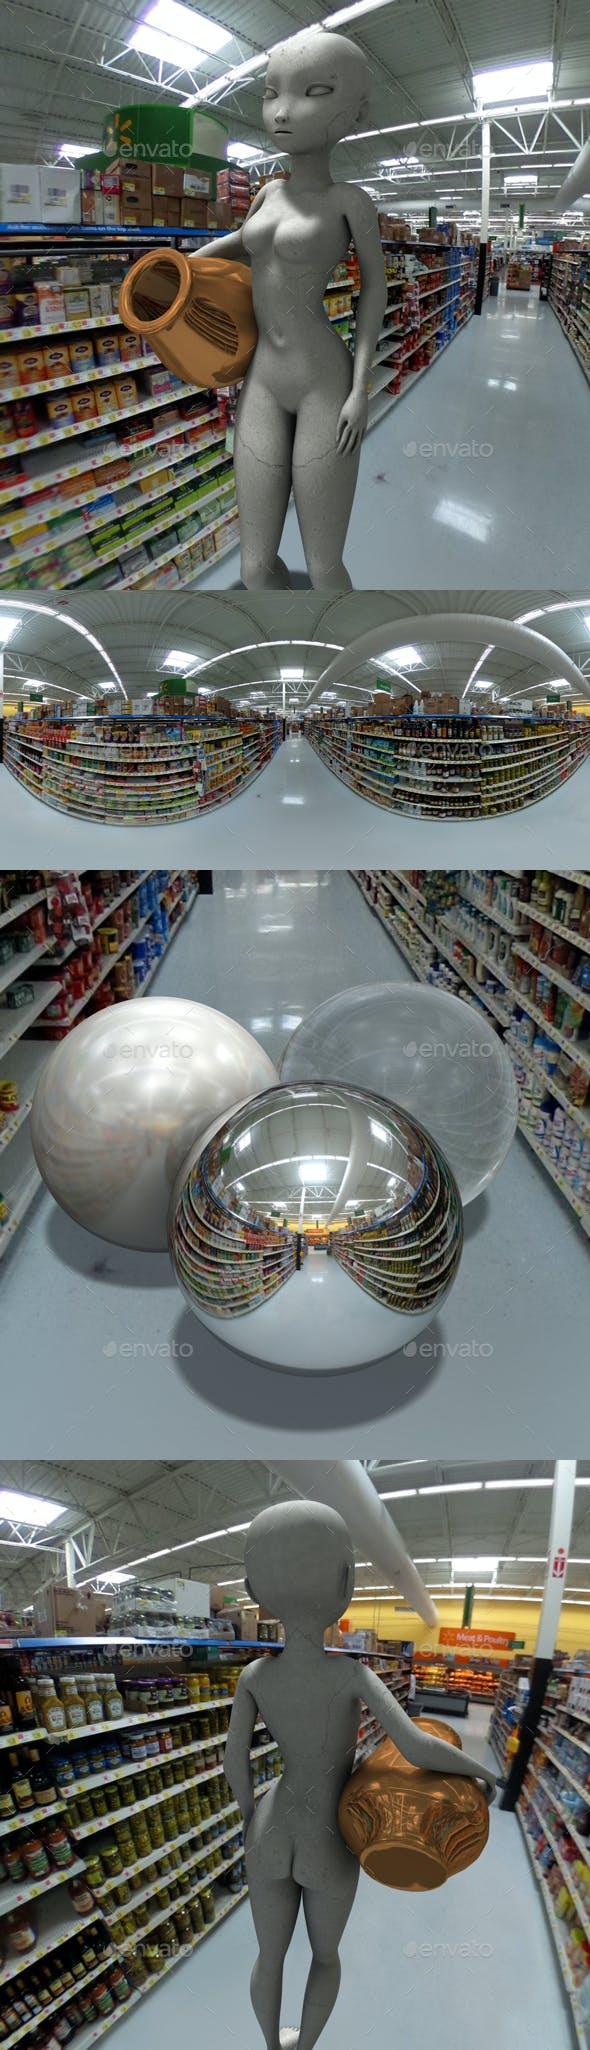 Supermarket HDRI - 3DOcean Item for Sale